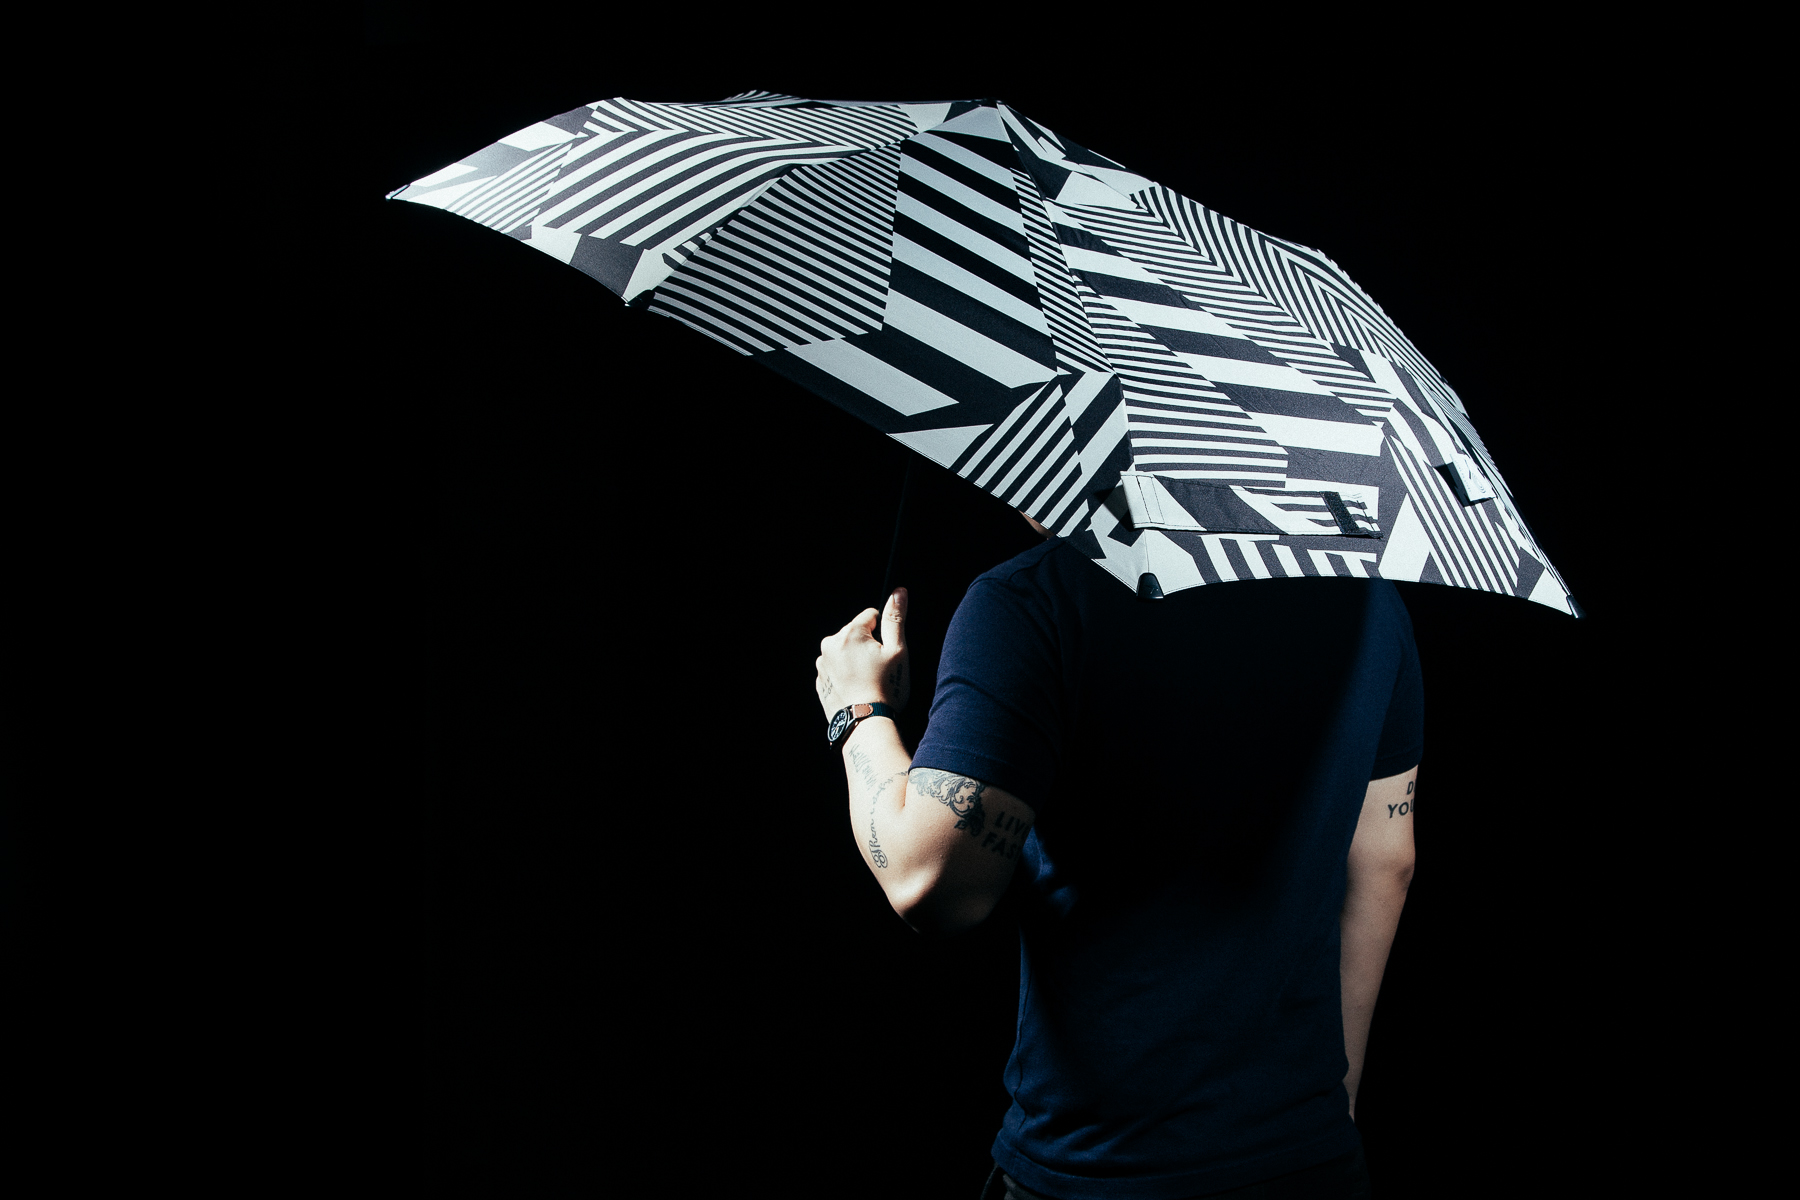 senz-2014-spring-summer-umbrellas-0